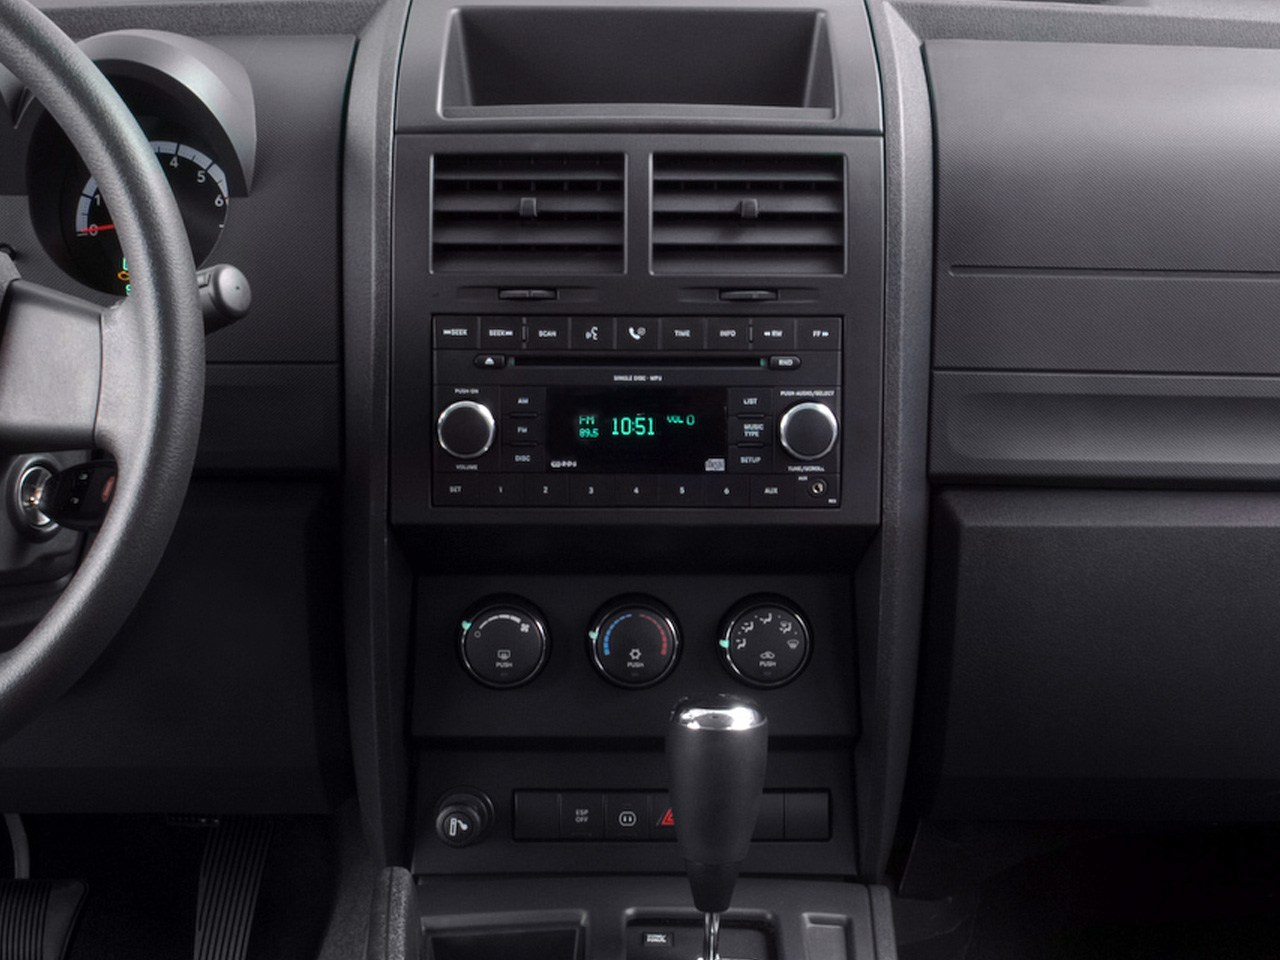 Dodge Nitro Interior Fuse Box Location Honda Trx 350 Wiring Diagram For Wiring Diagram Schematics